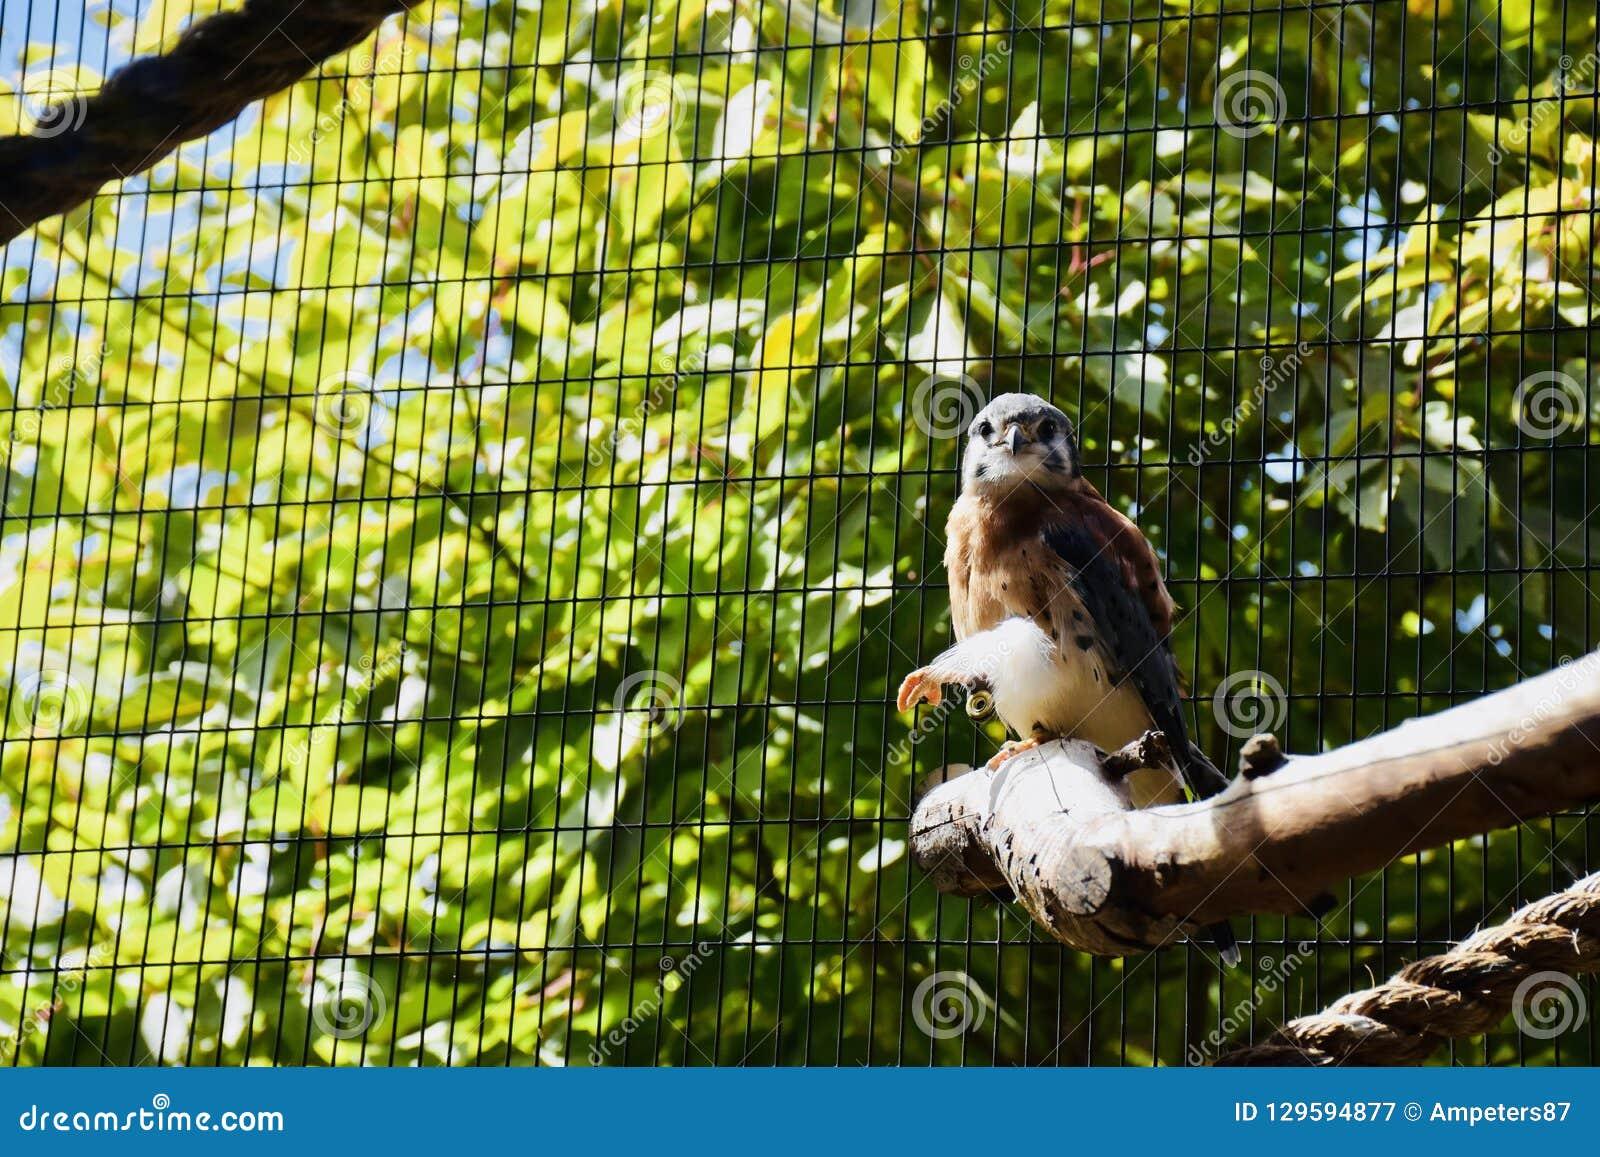 Bird of prey at Cheyenne Mountain Zoo